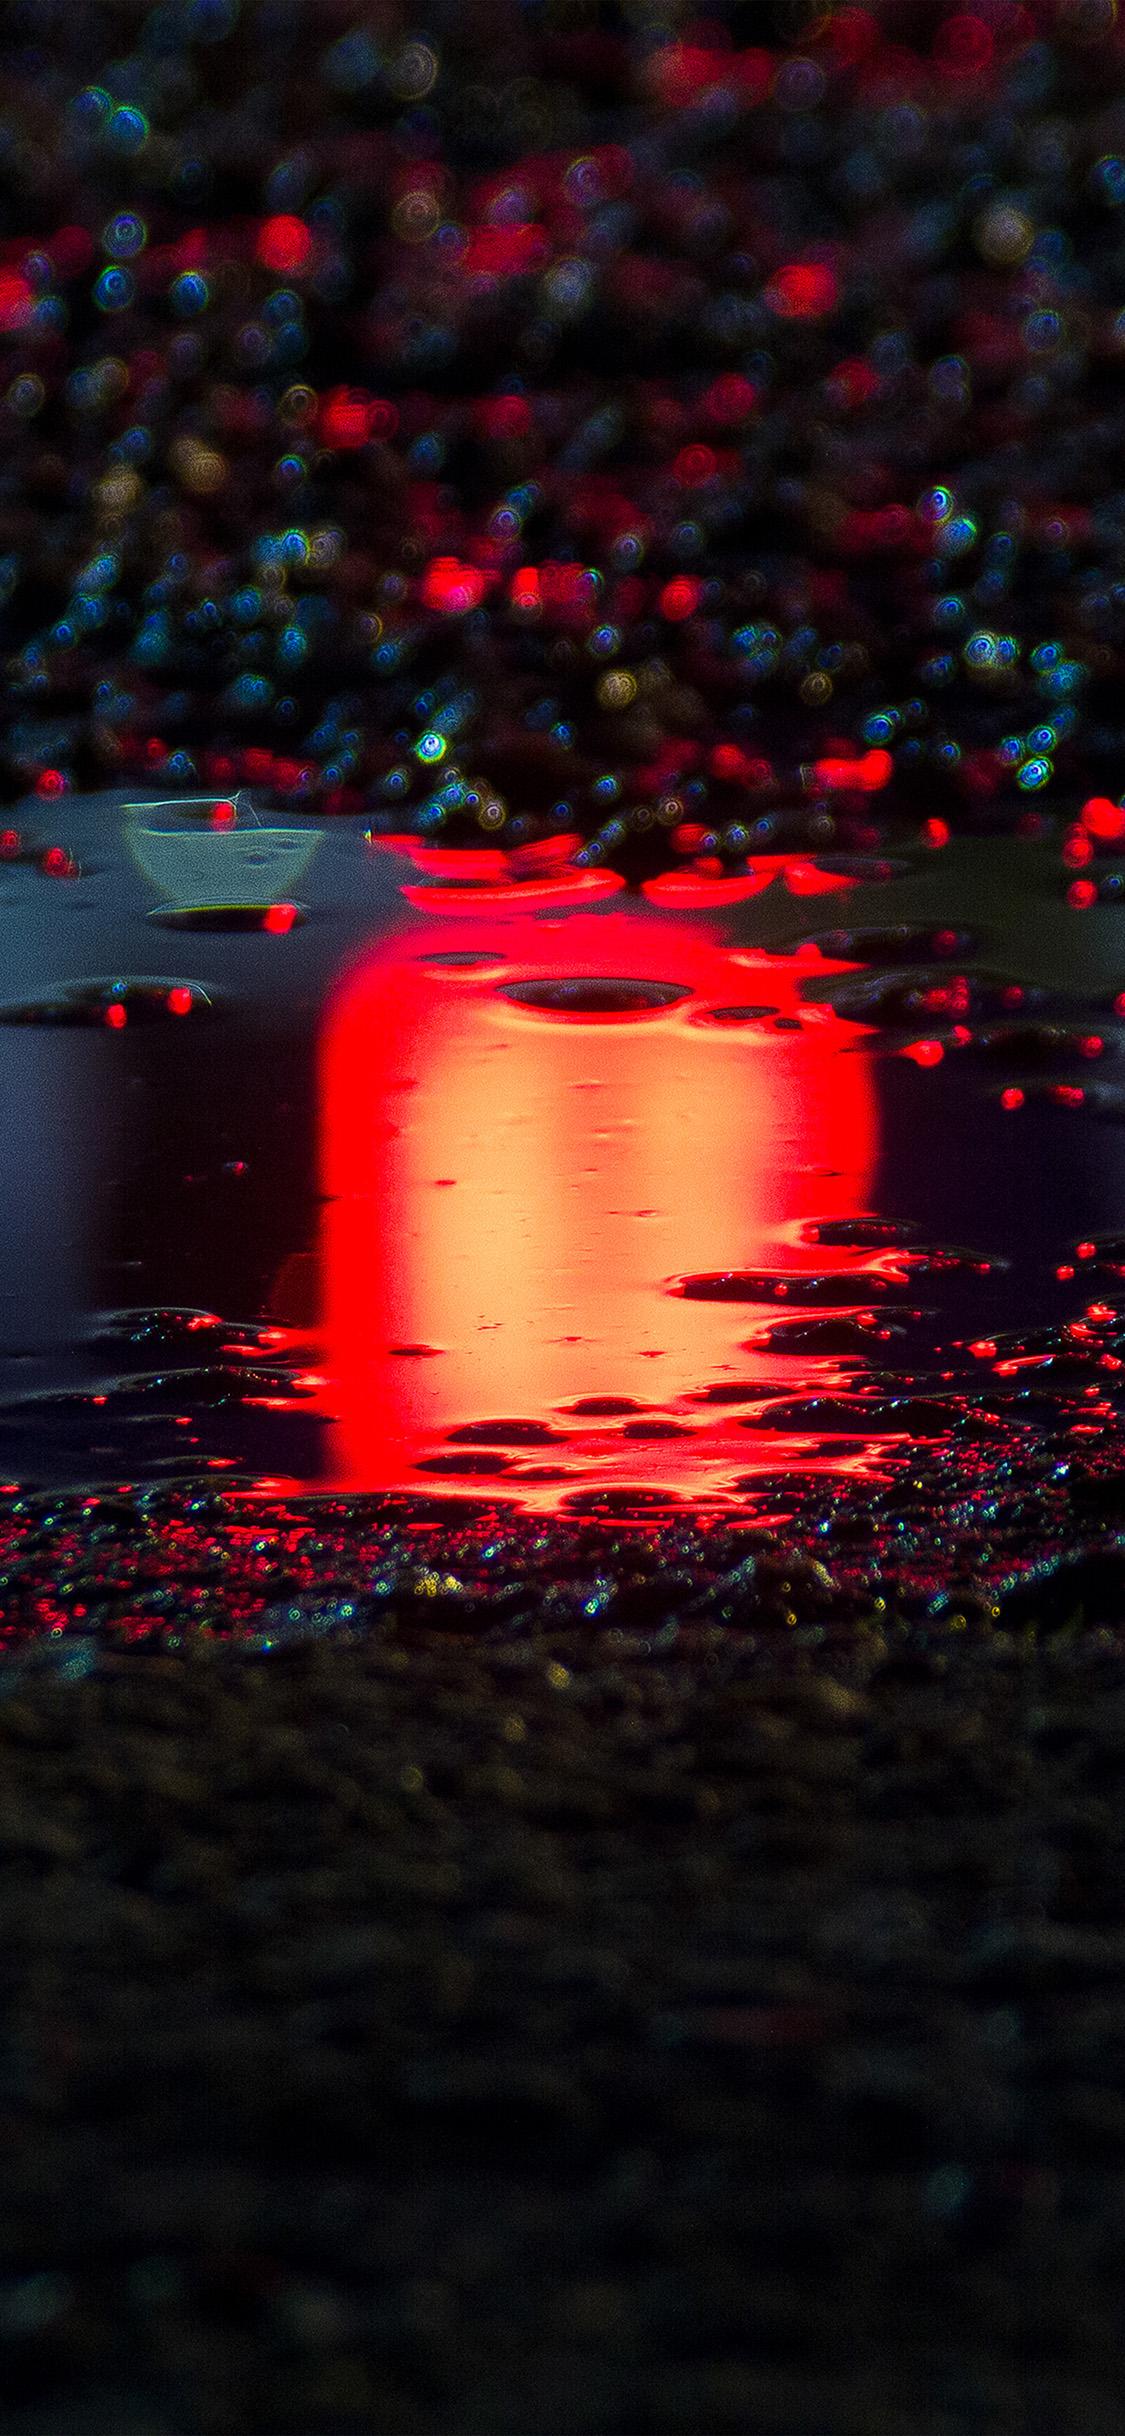 iPhonexpapers.com-Apple-iPhone-wallpaper-bf60-rain-red-bokeh-water-asphalt-art-light